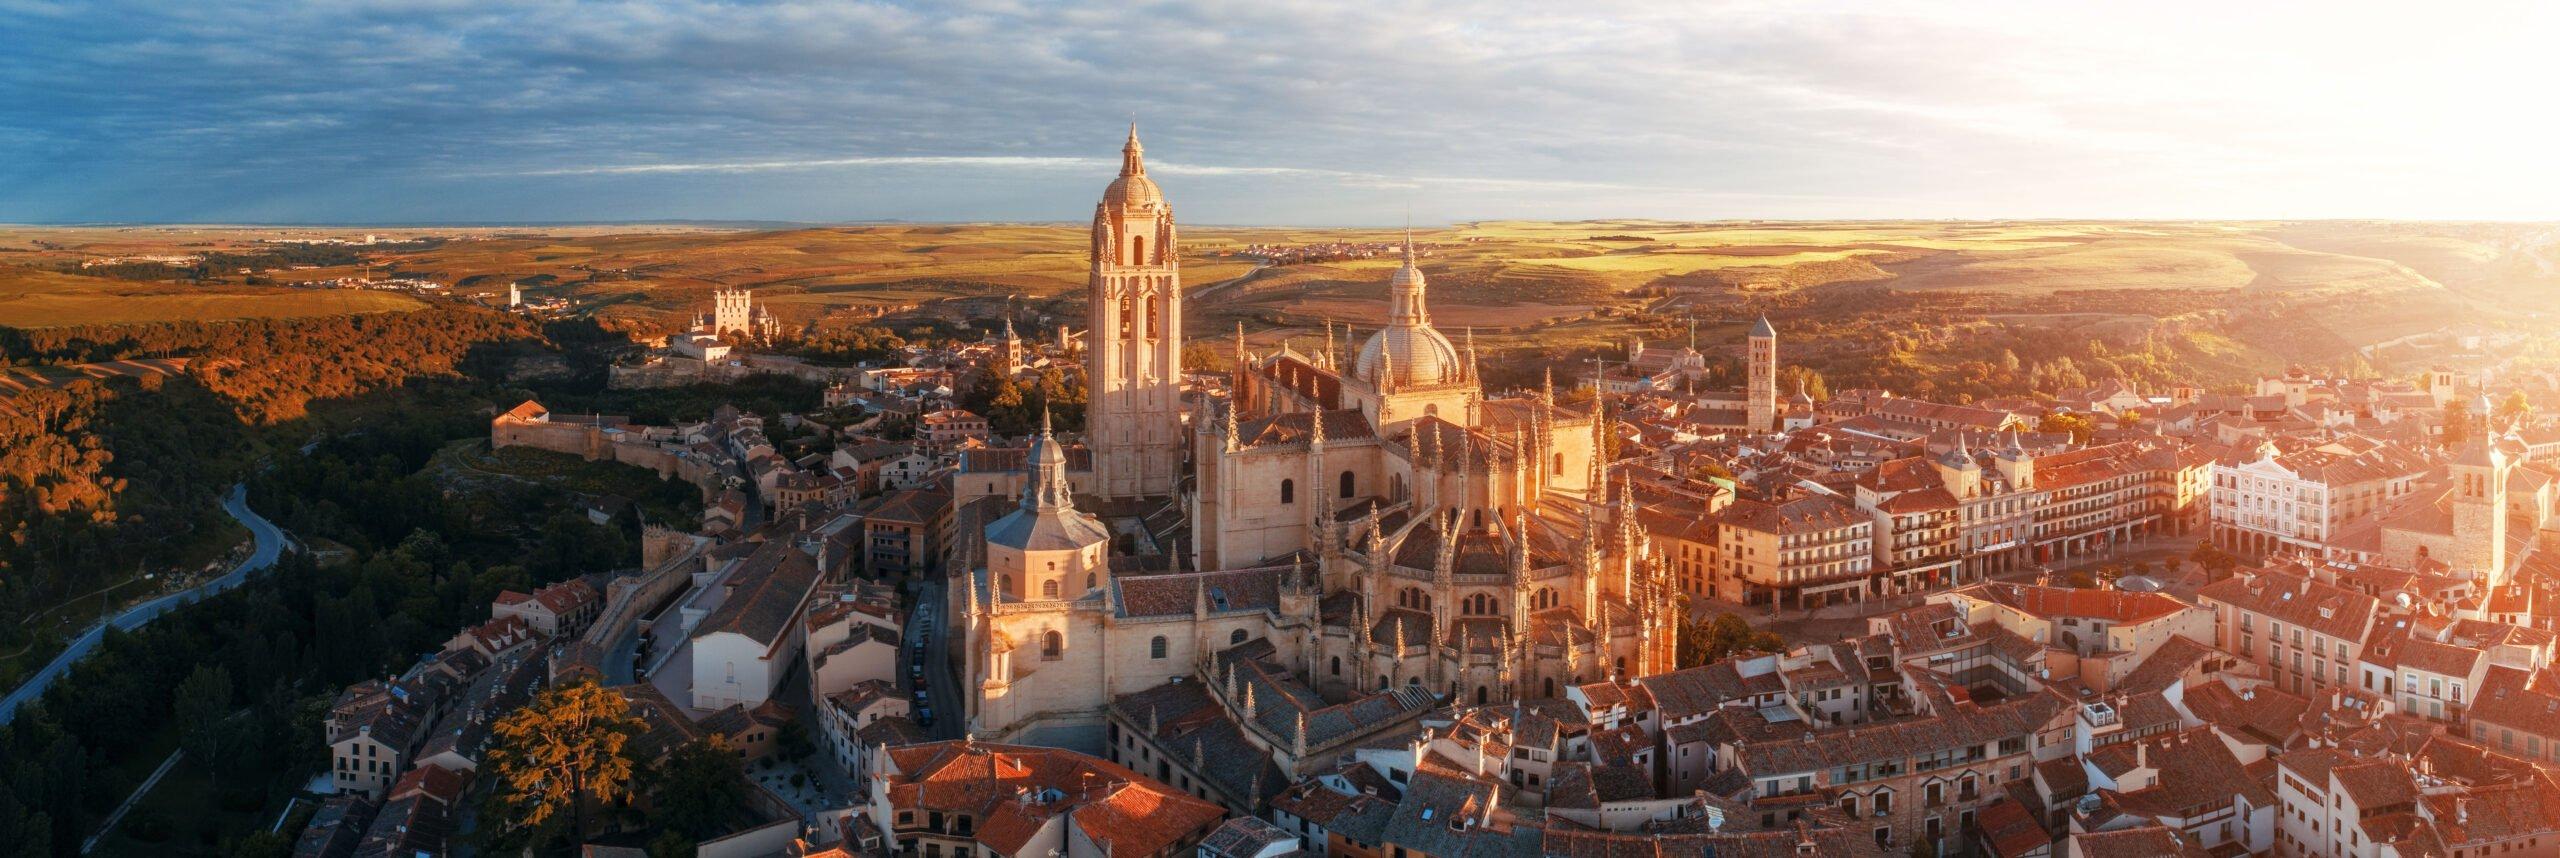 Explore Alcazar Castle In Our Sierra De Guadarrama Hiking & Segovia Tour